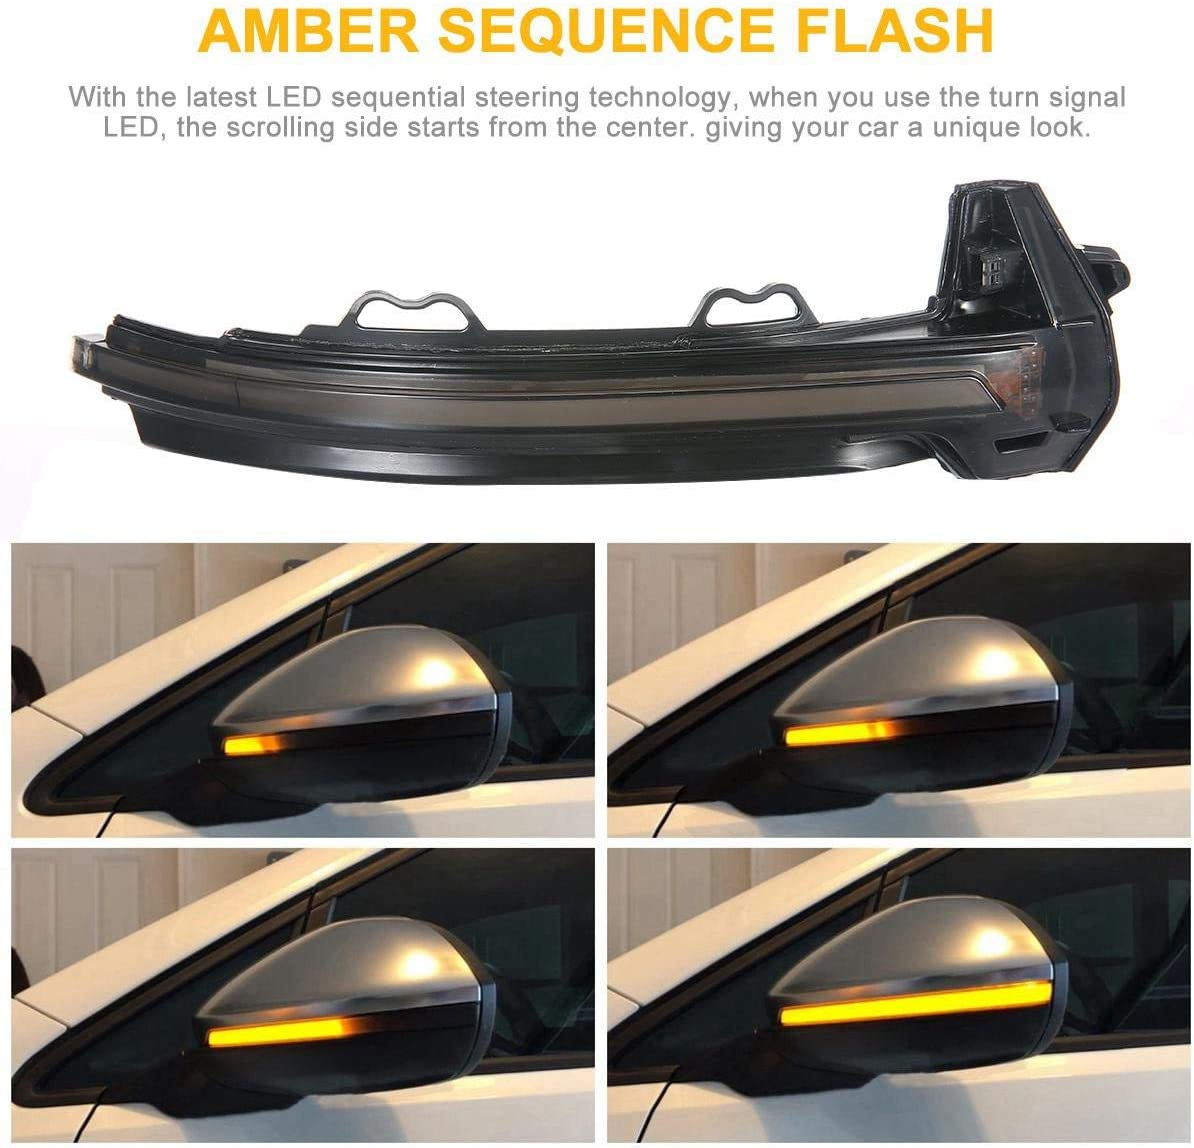 A5 // S5 B9 // 8F Moshbu Spiegelblinker Auto Dynamische LED Blinkerleuchten f/ür Audi A4 // S4 B9 // 8W 1 Paar 1 Par - Attraktives Seitenspiegel-Signaldesign